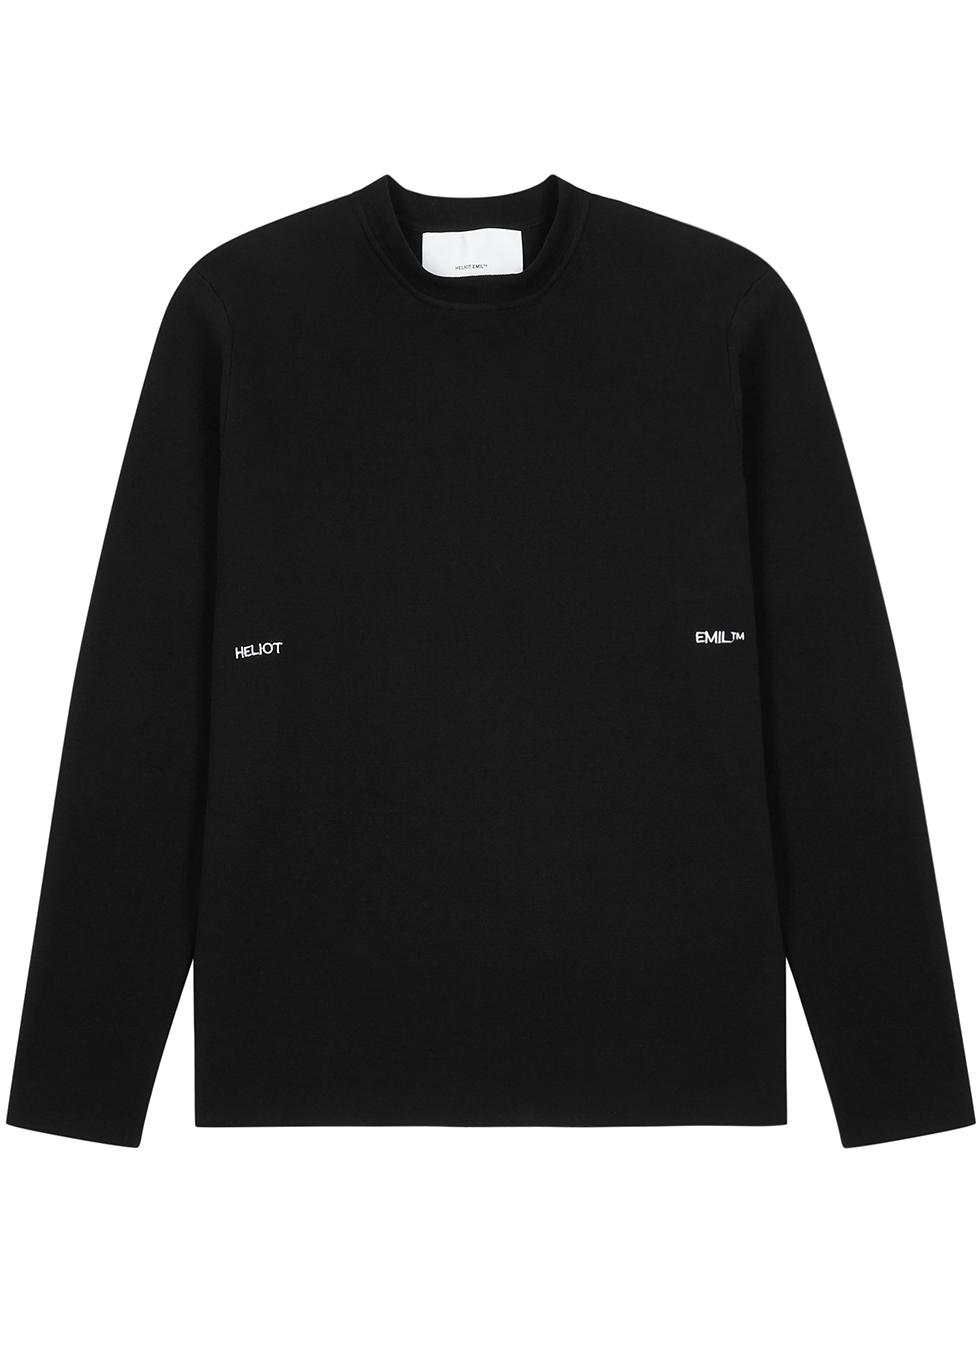 Black fine-knit cotton jumper